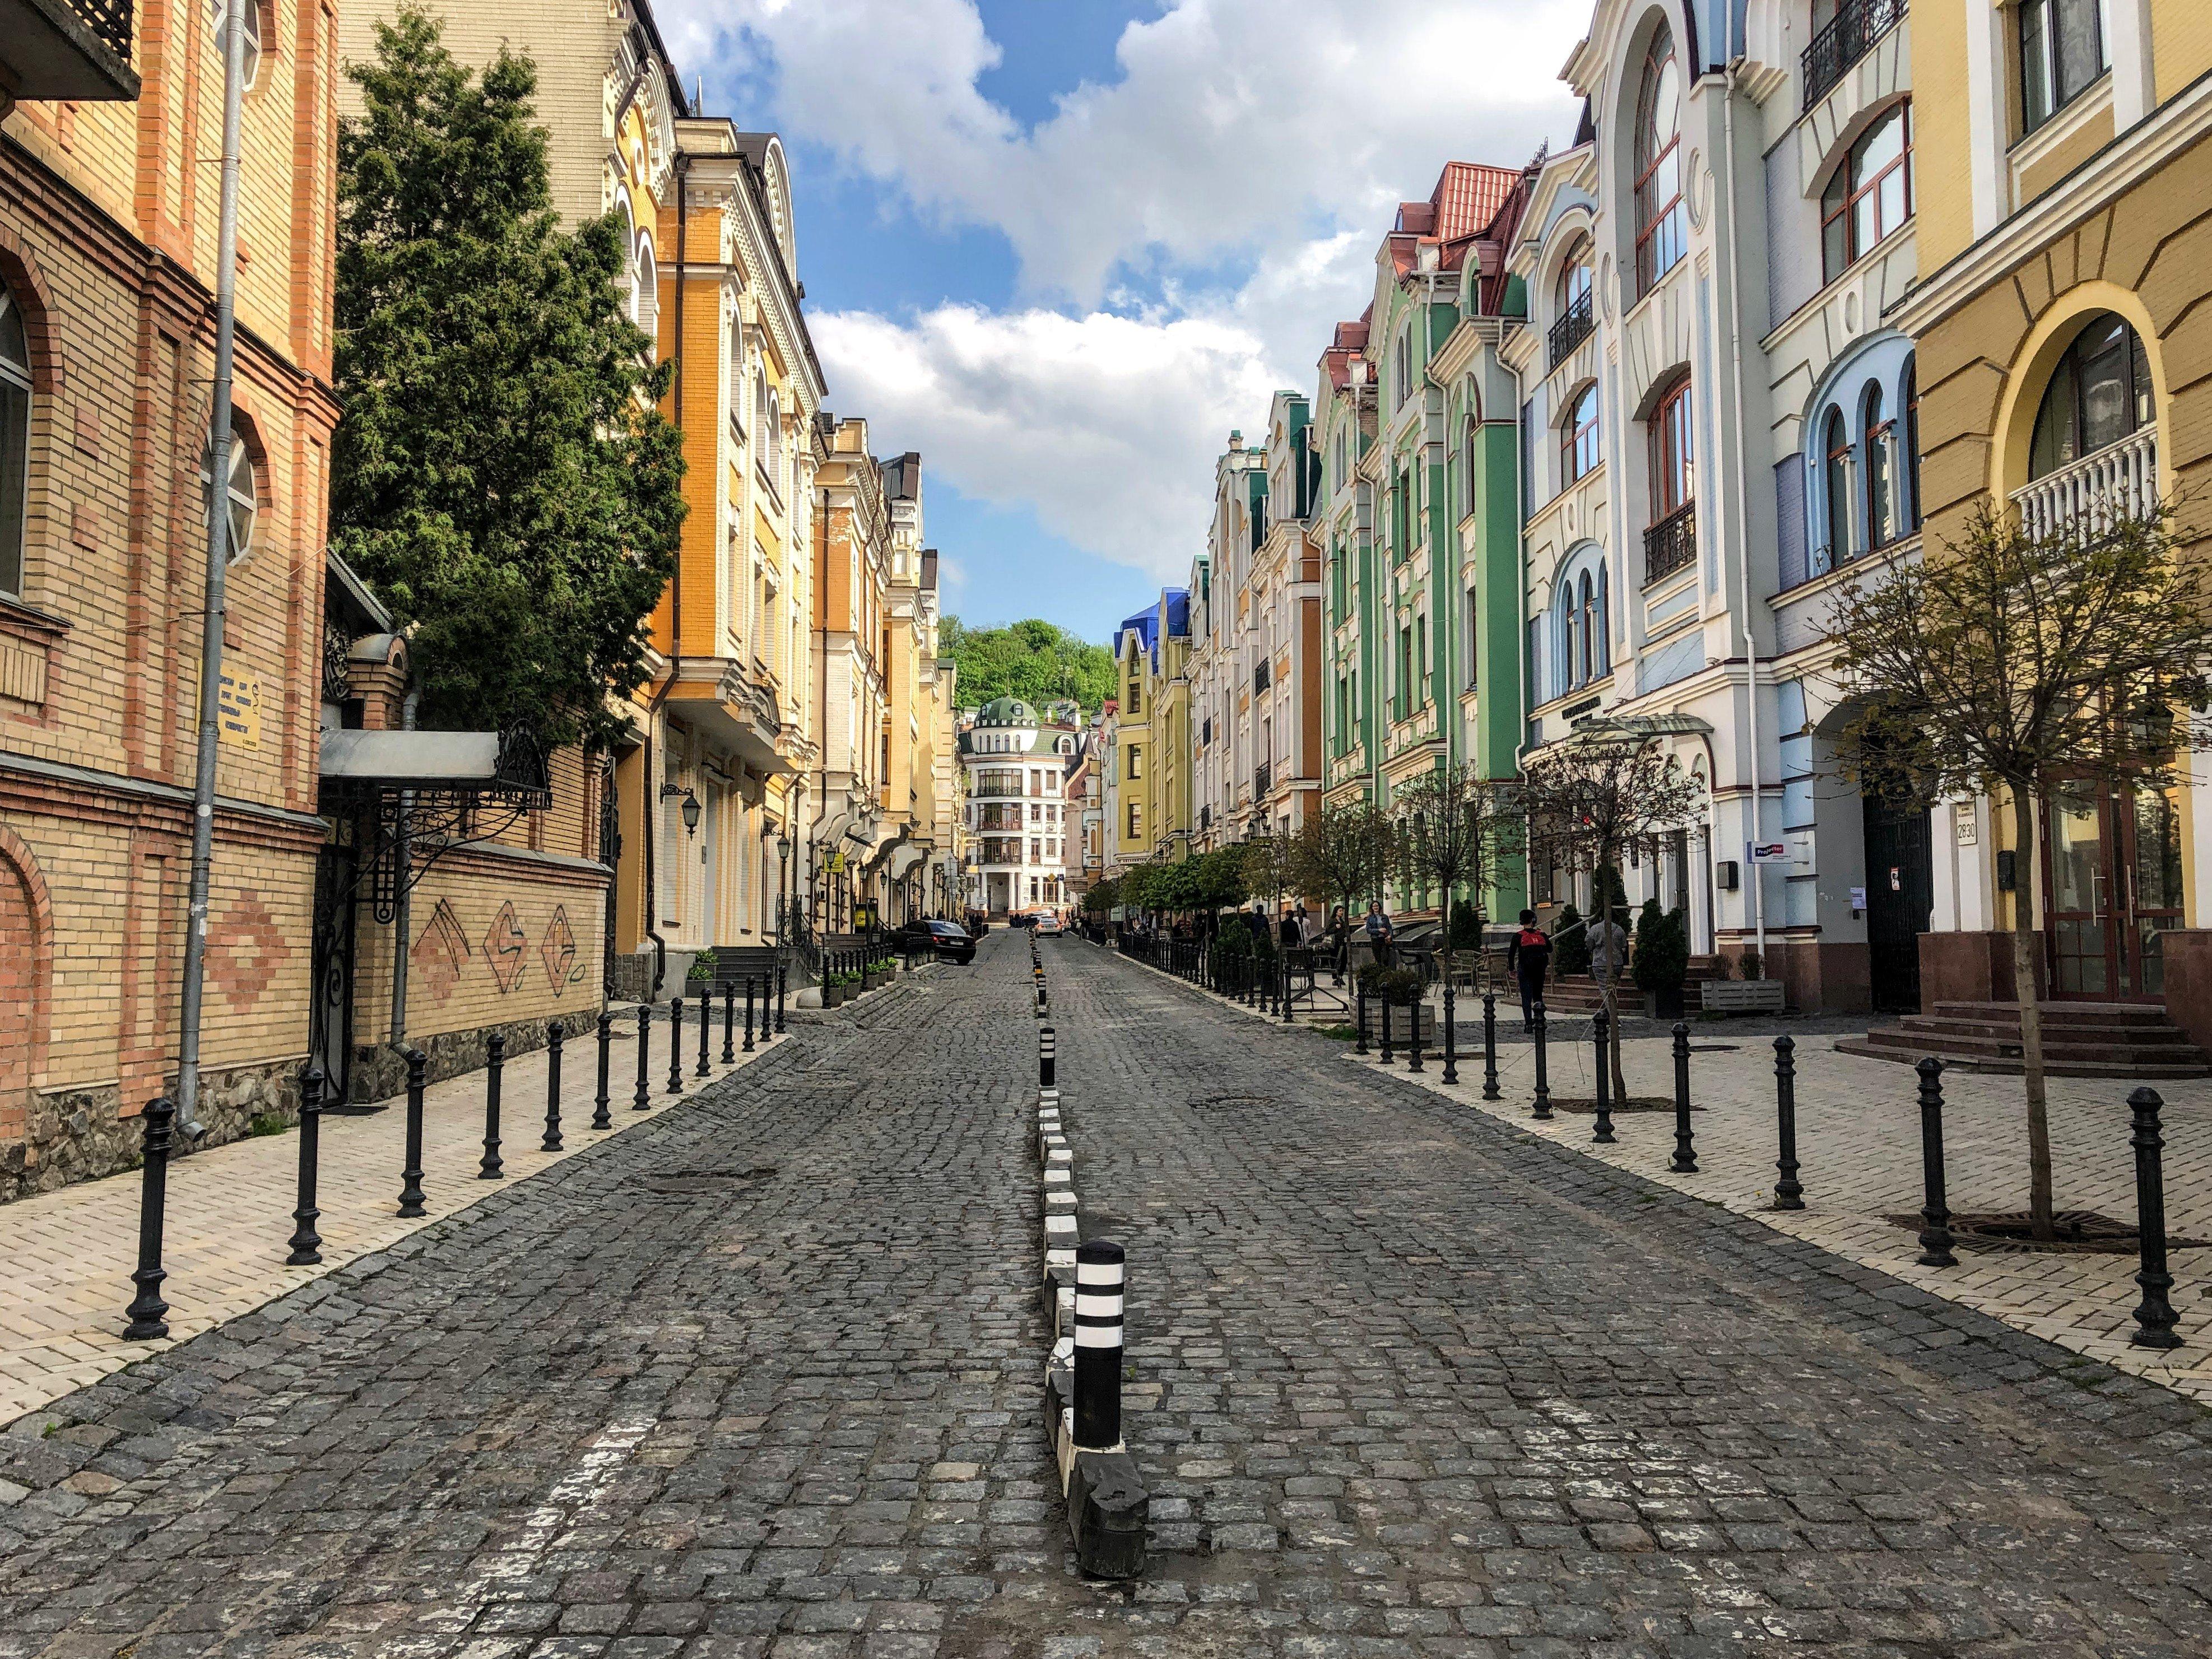 colorful houses in the Vozdvyzhenka neighborhood